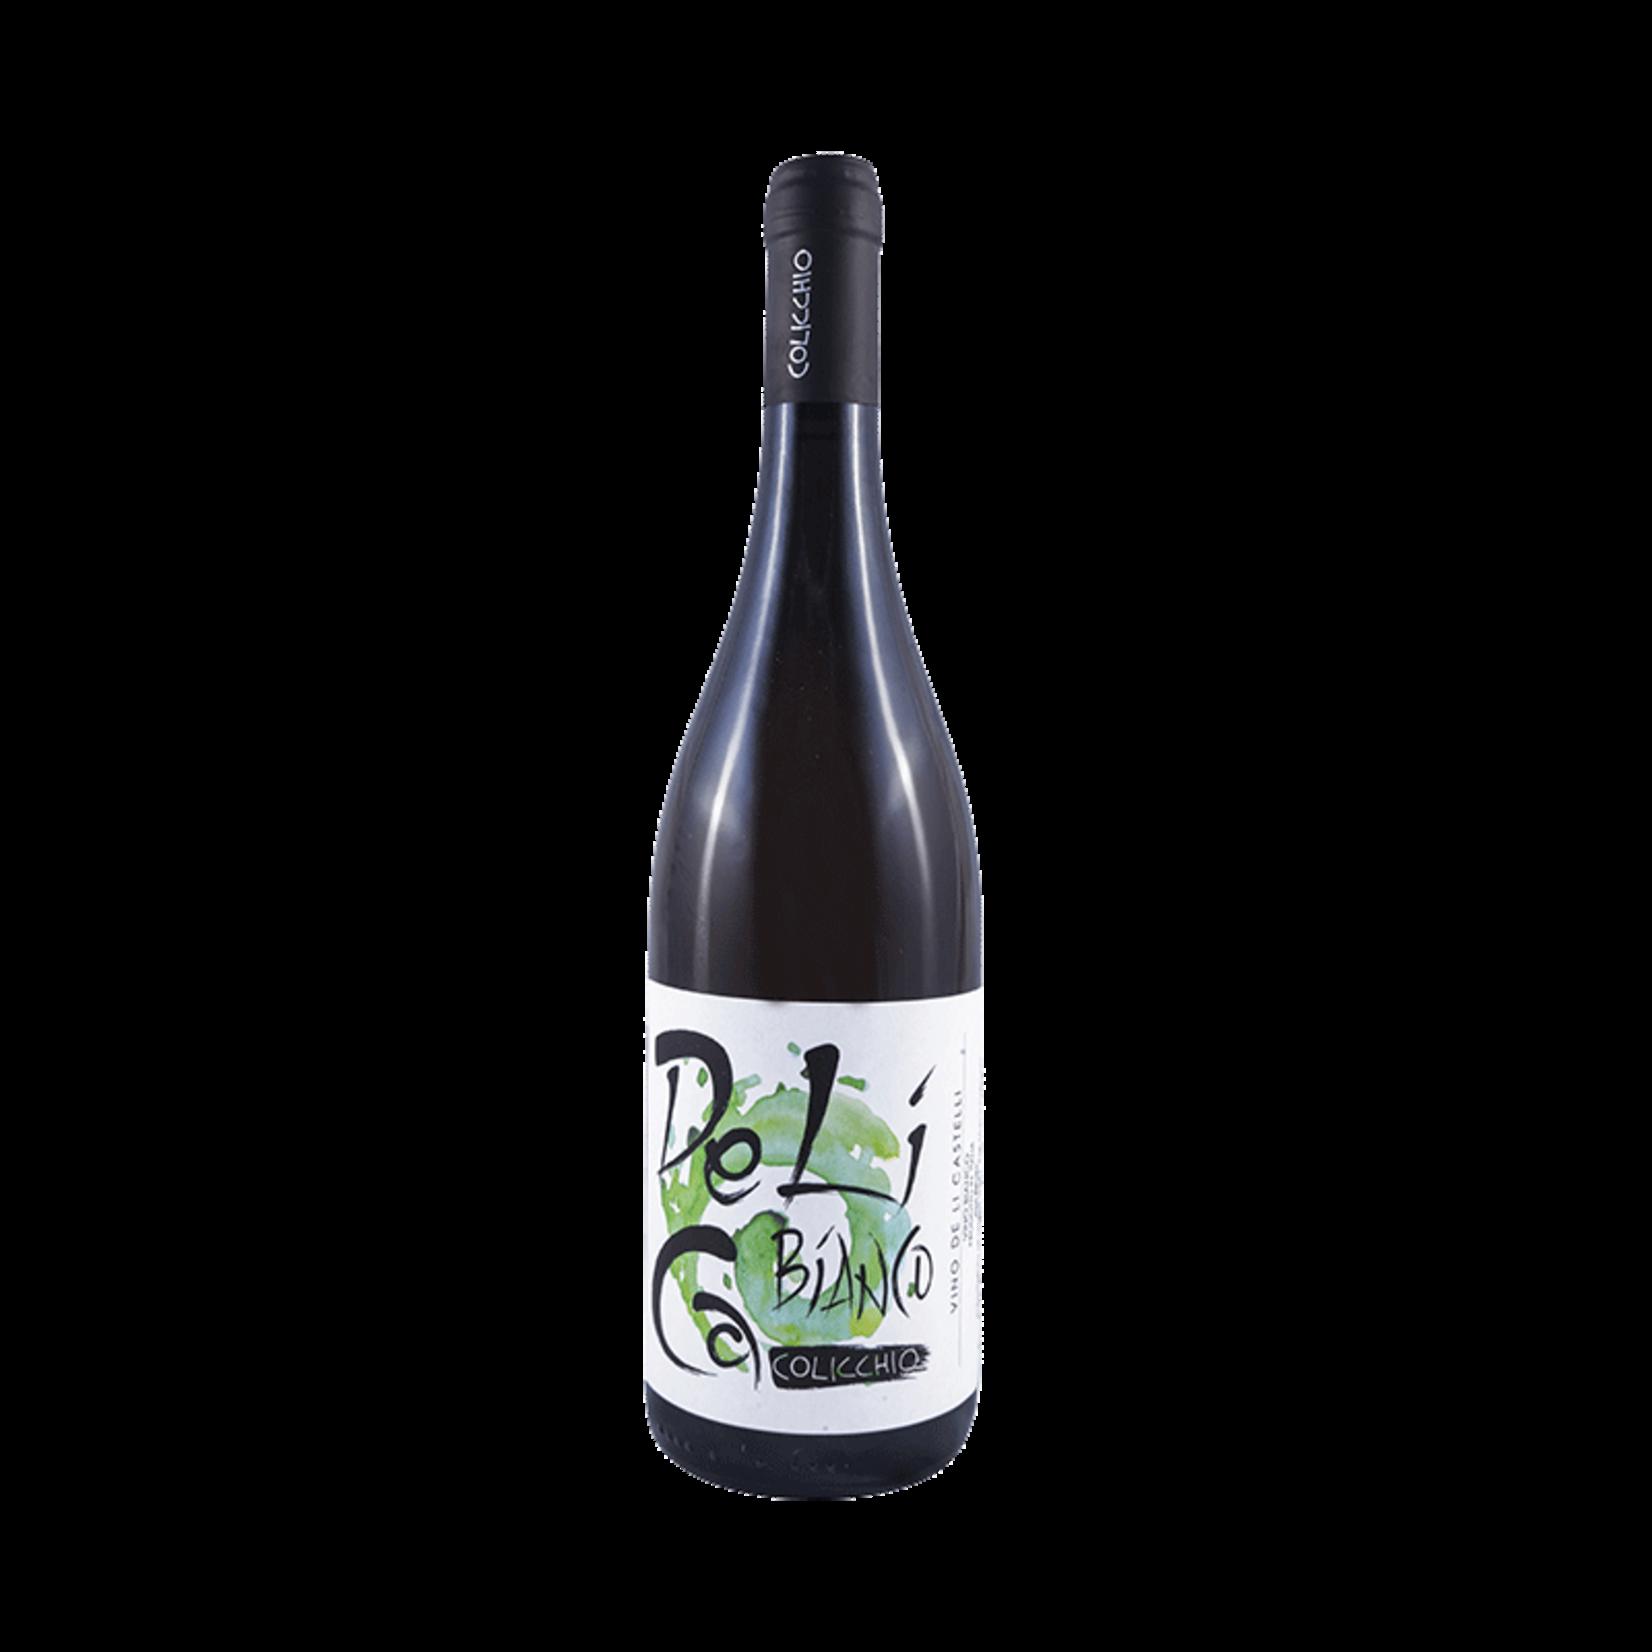 Wine Colicchio Bianco